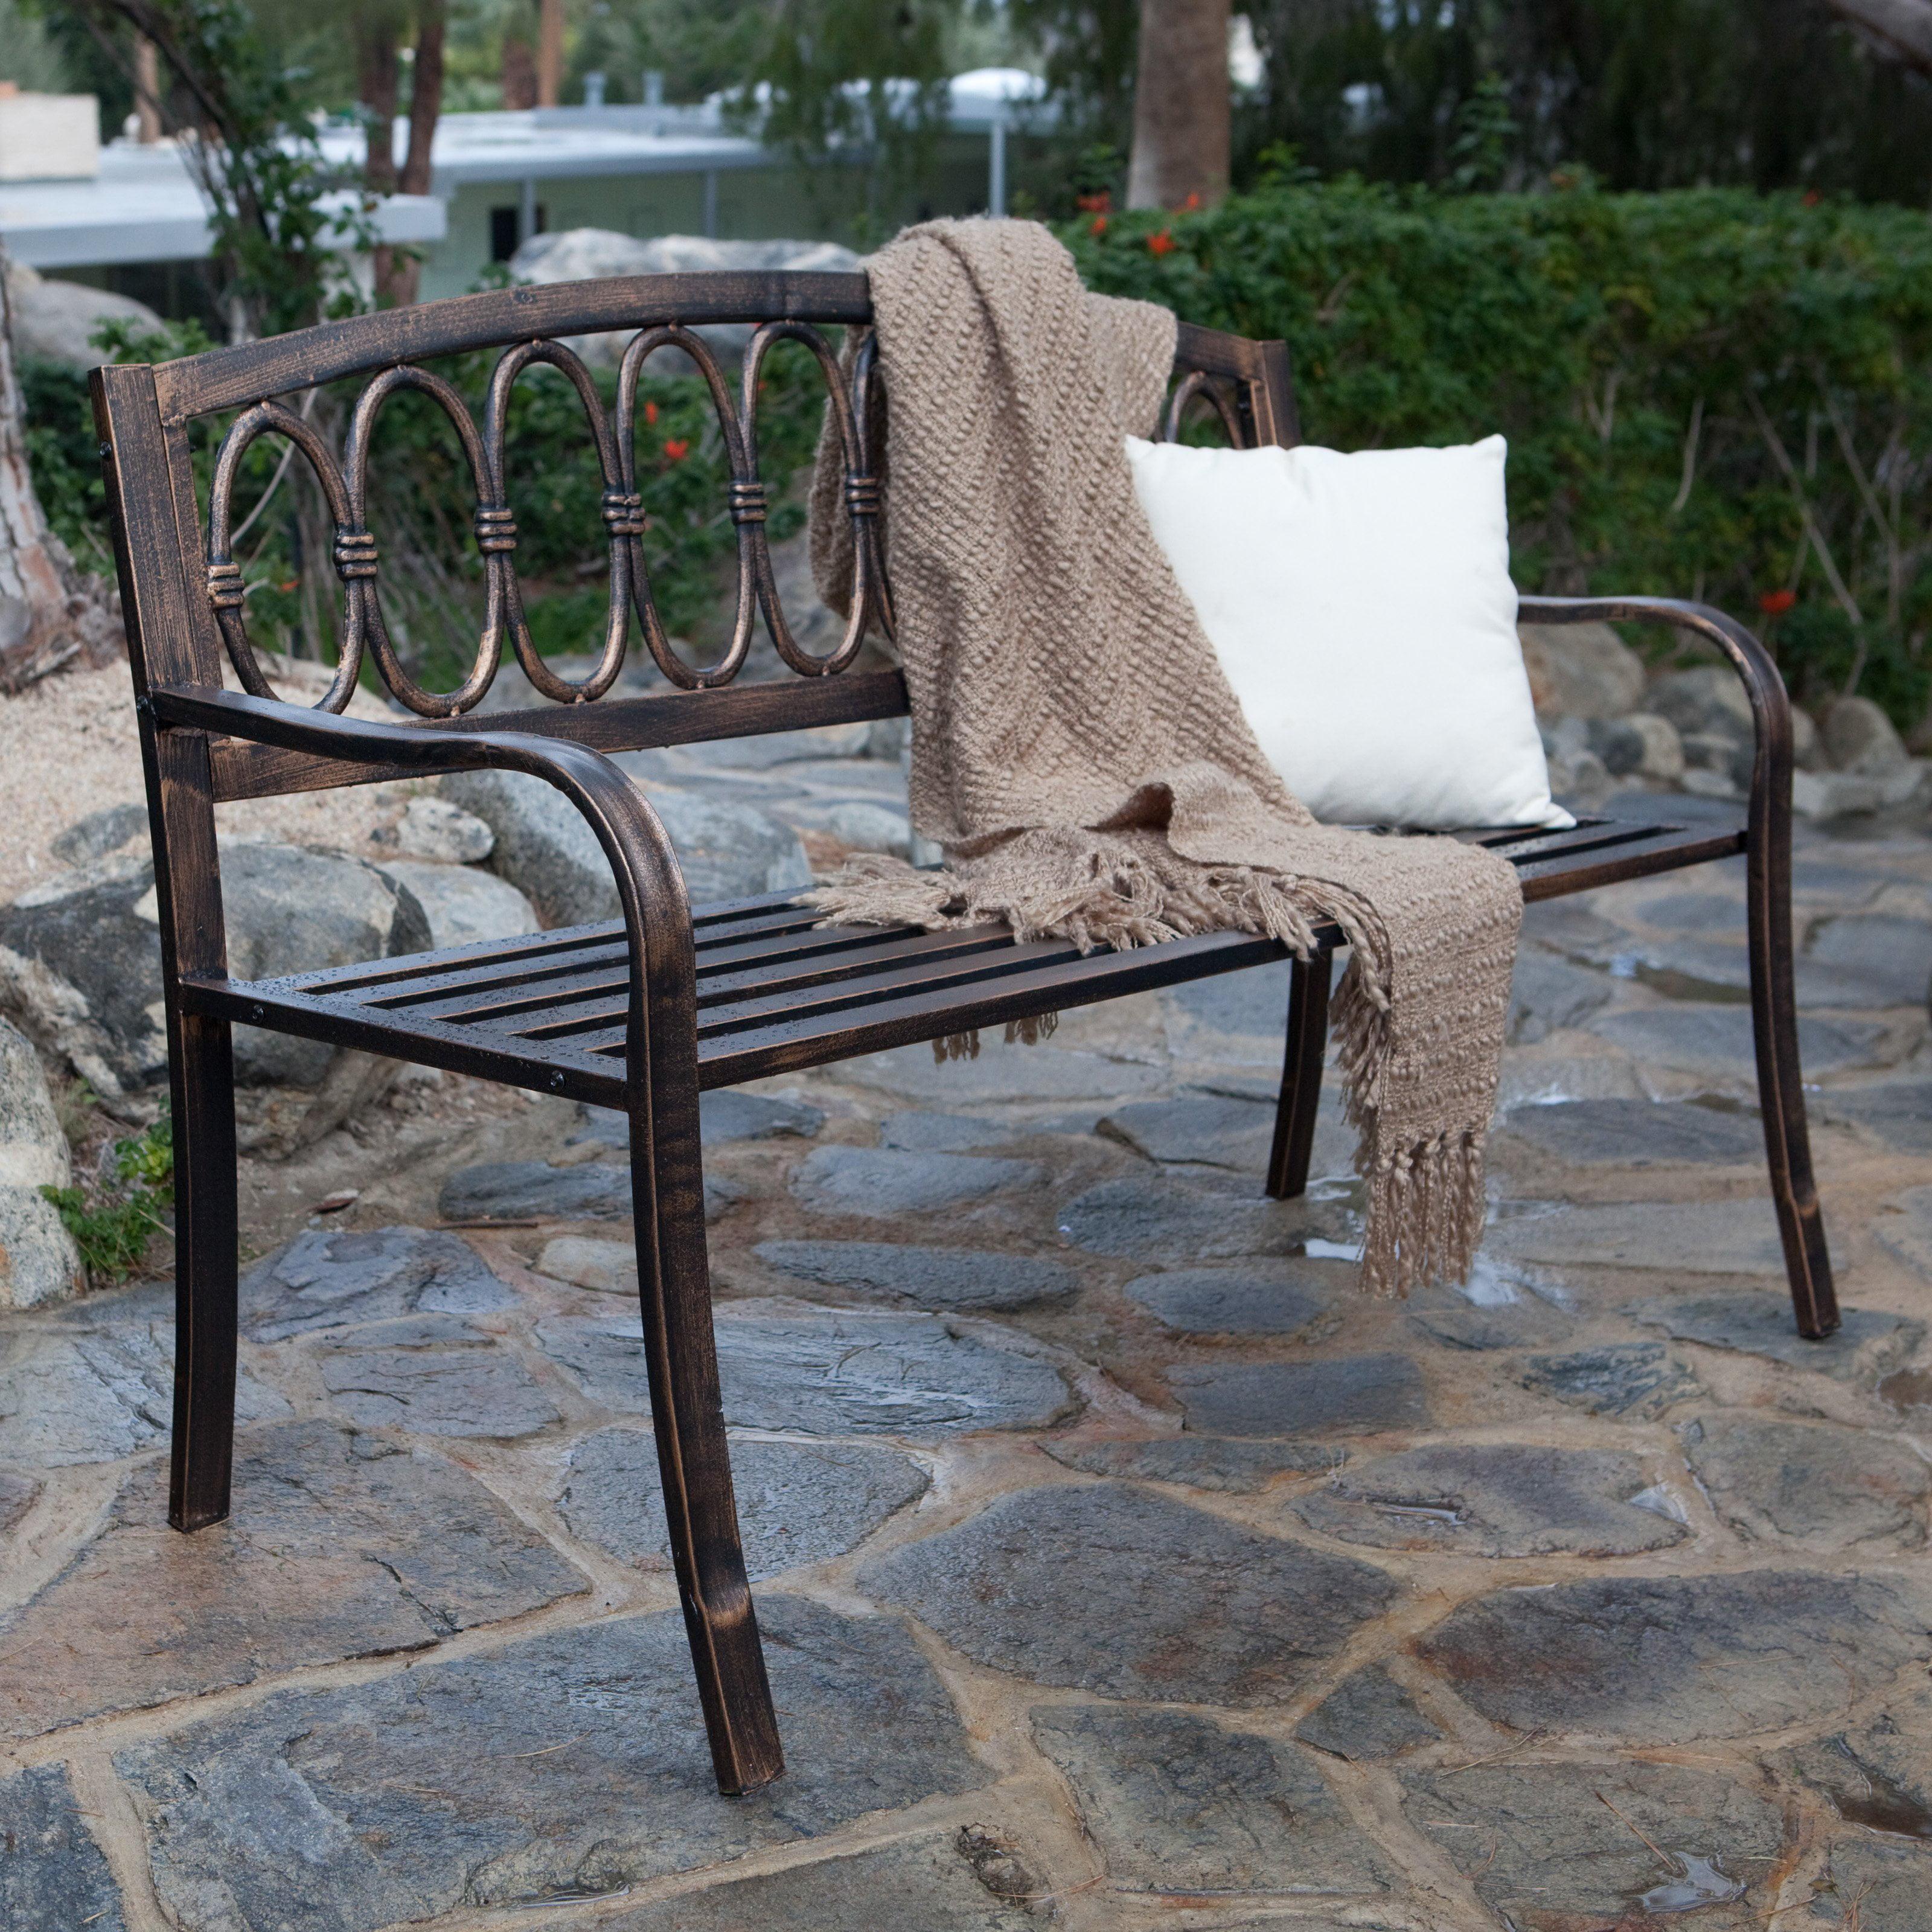 Coral Coast Verona 4 Ft. Curved Back Garden Bench   Antique Gold    Walmart.com Part 77